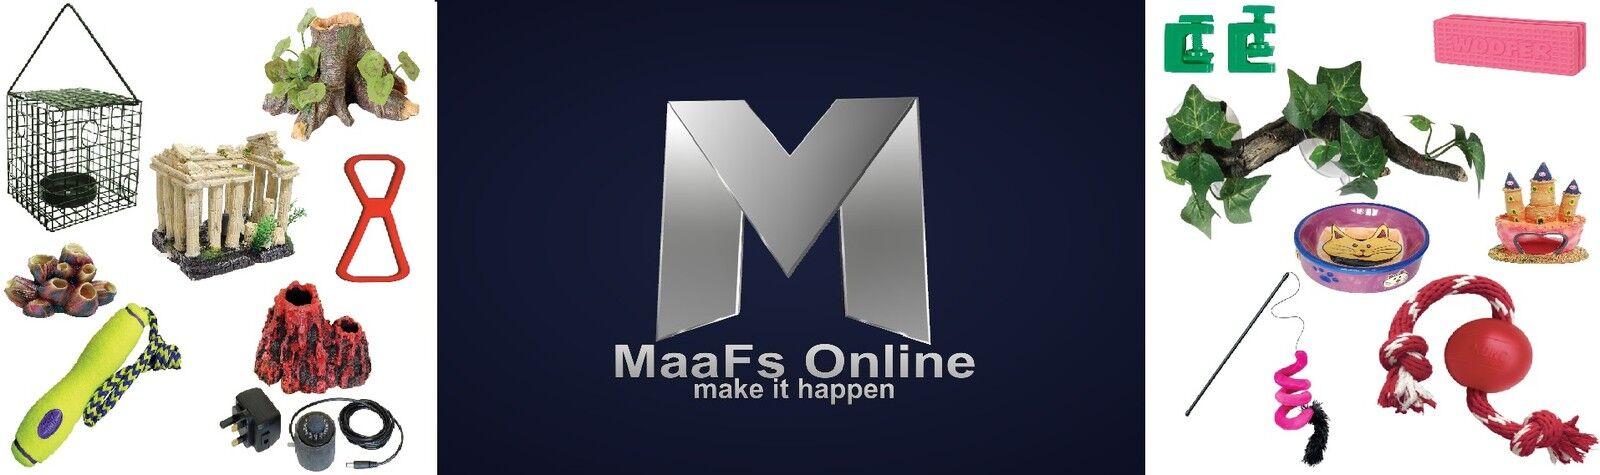 MaaFs Online